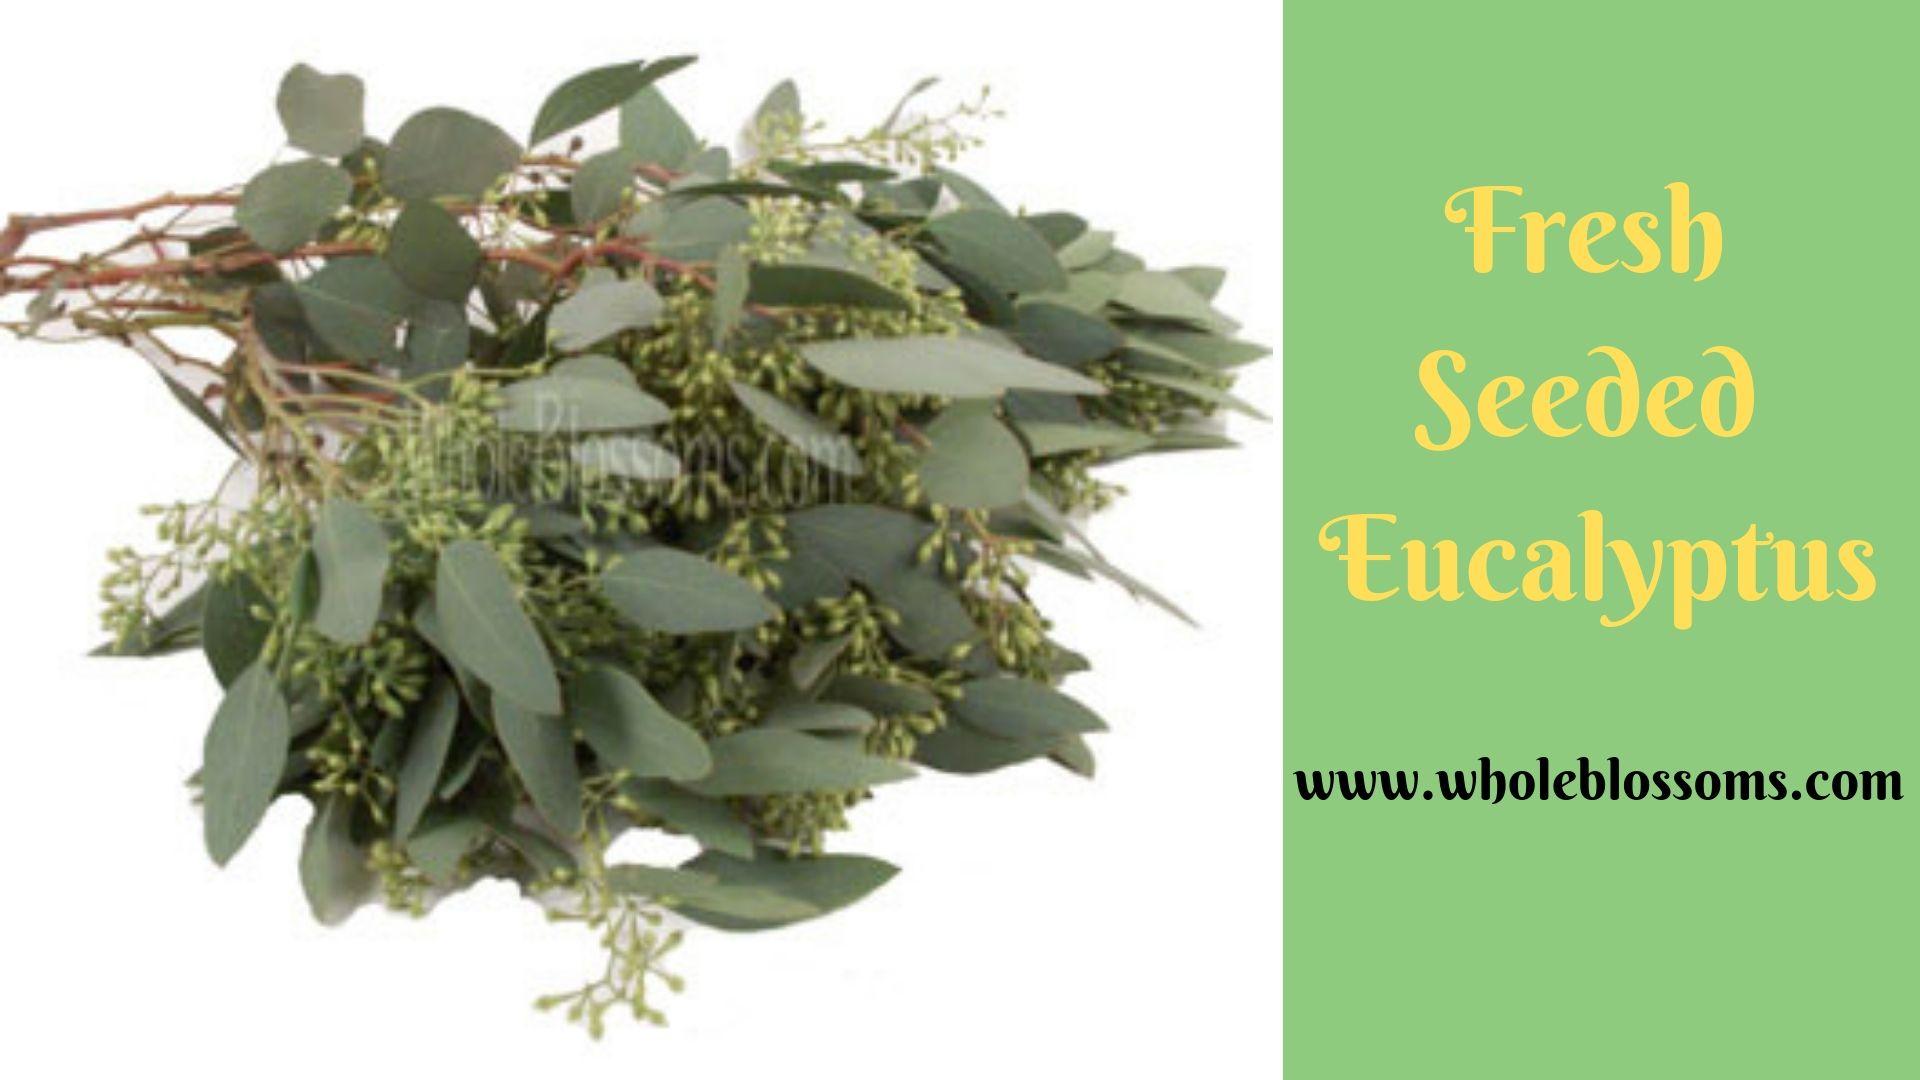 Seeded Eucalyptus Seeded eucalyptus, Eucalyptus, Seeds